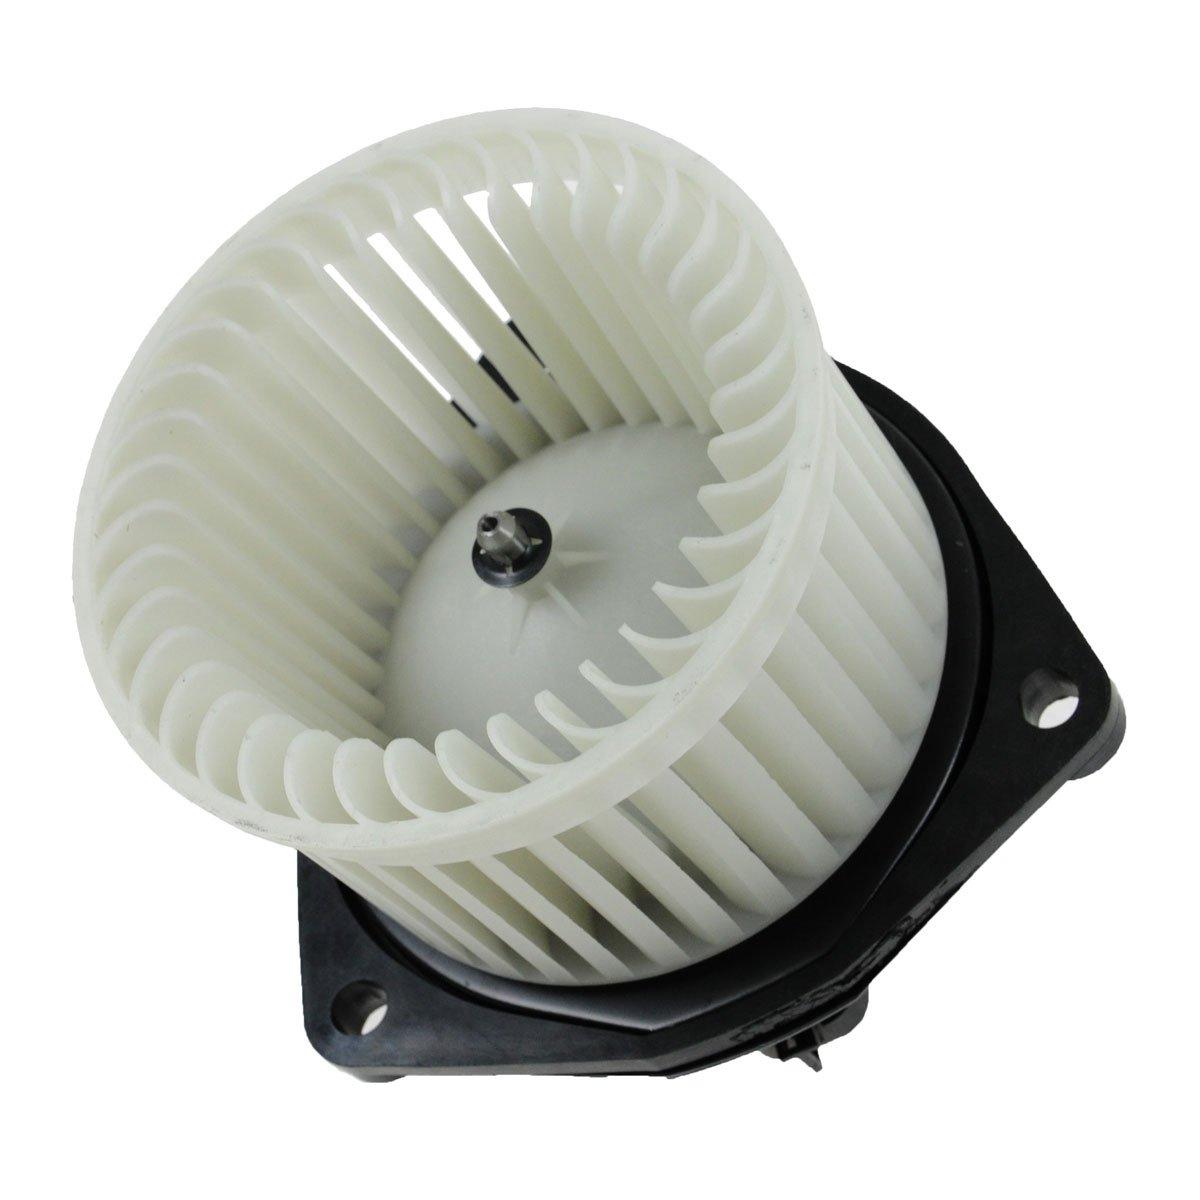 Heater Blower Motor w// Fan Cage for Chevy Malibu Maxx